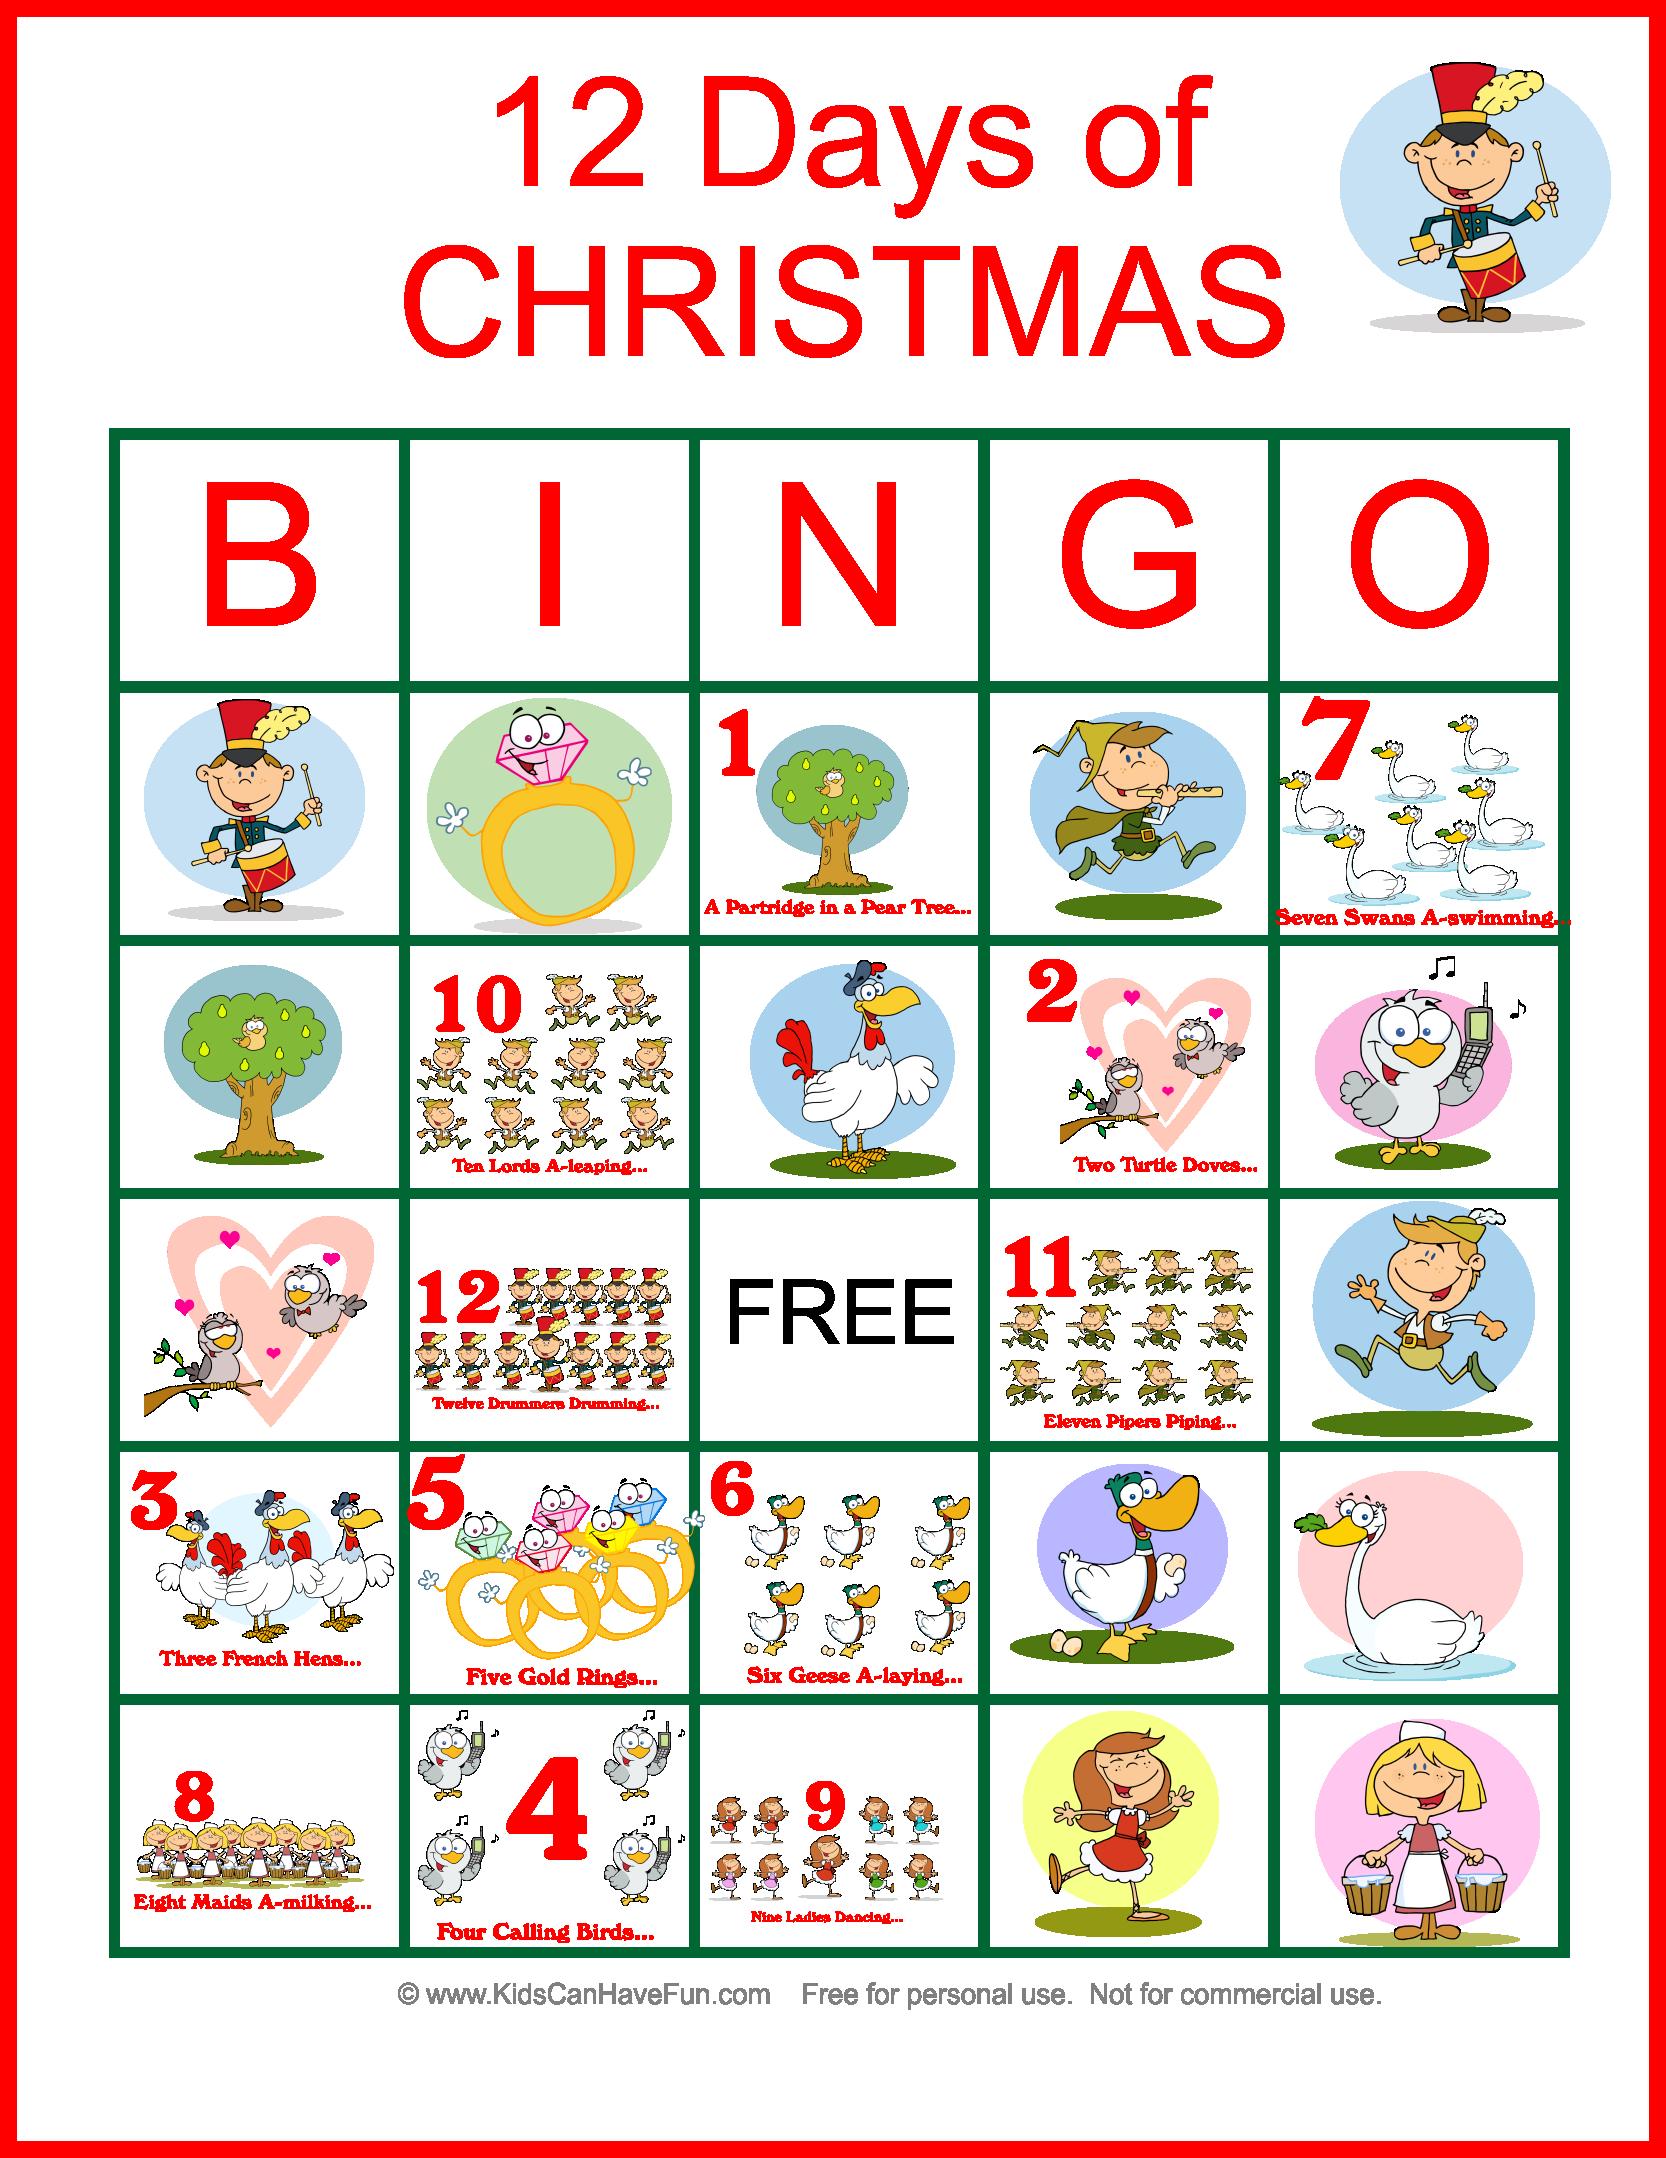 Twelve Days Of Christmas Bingo For The Whole Family